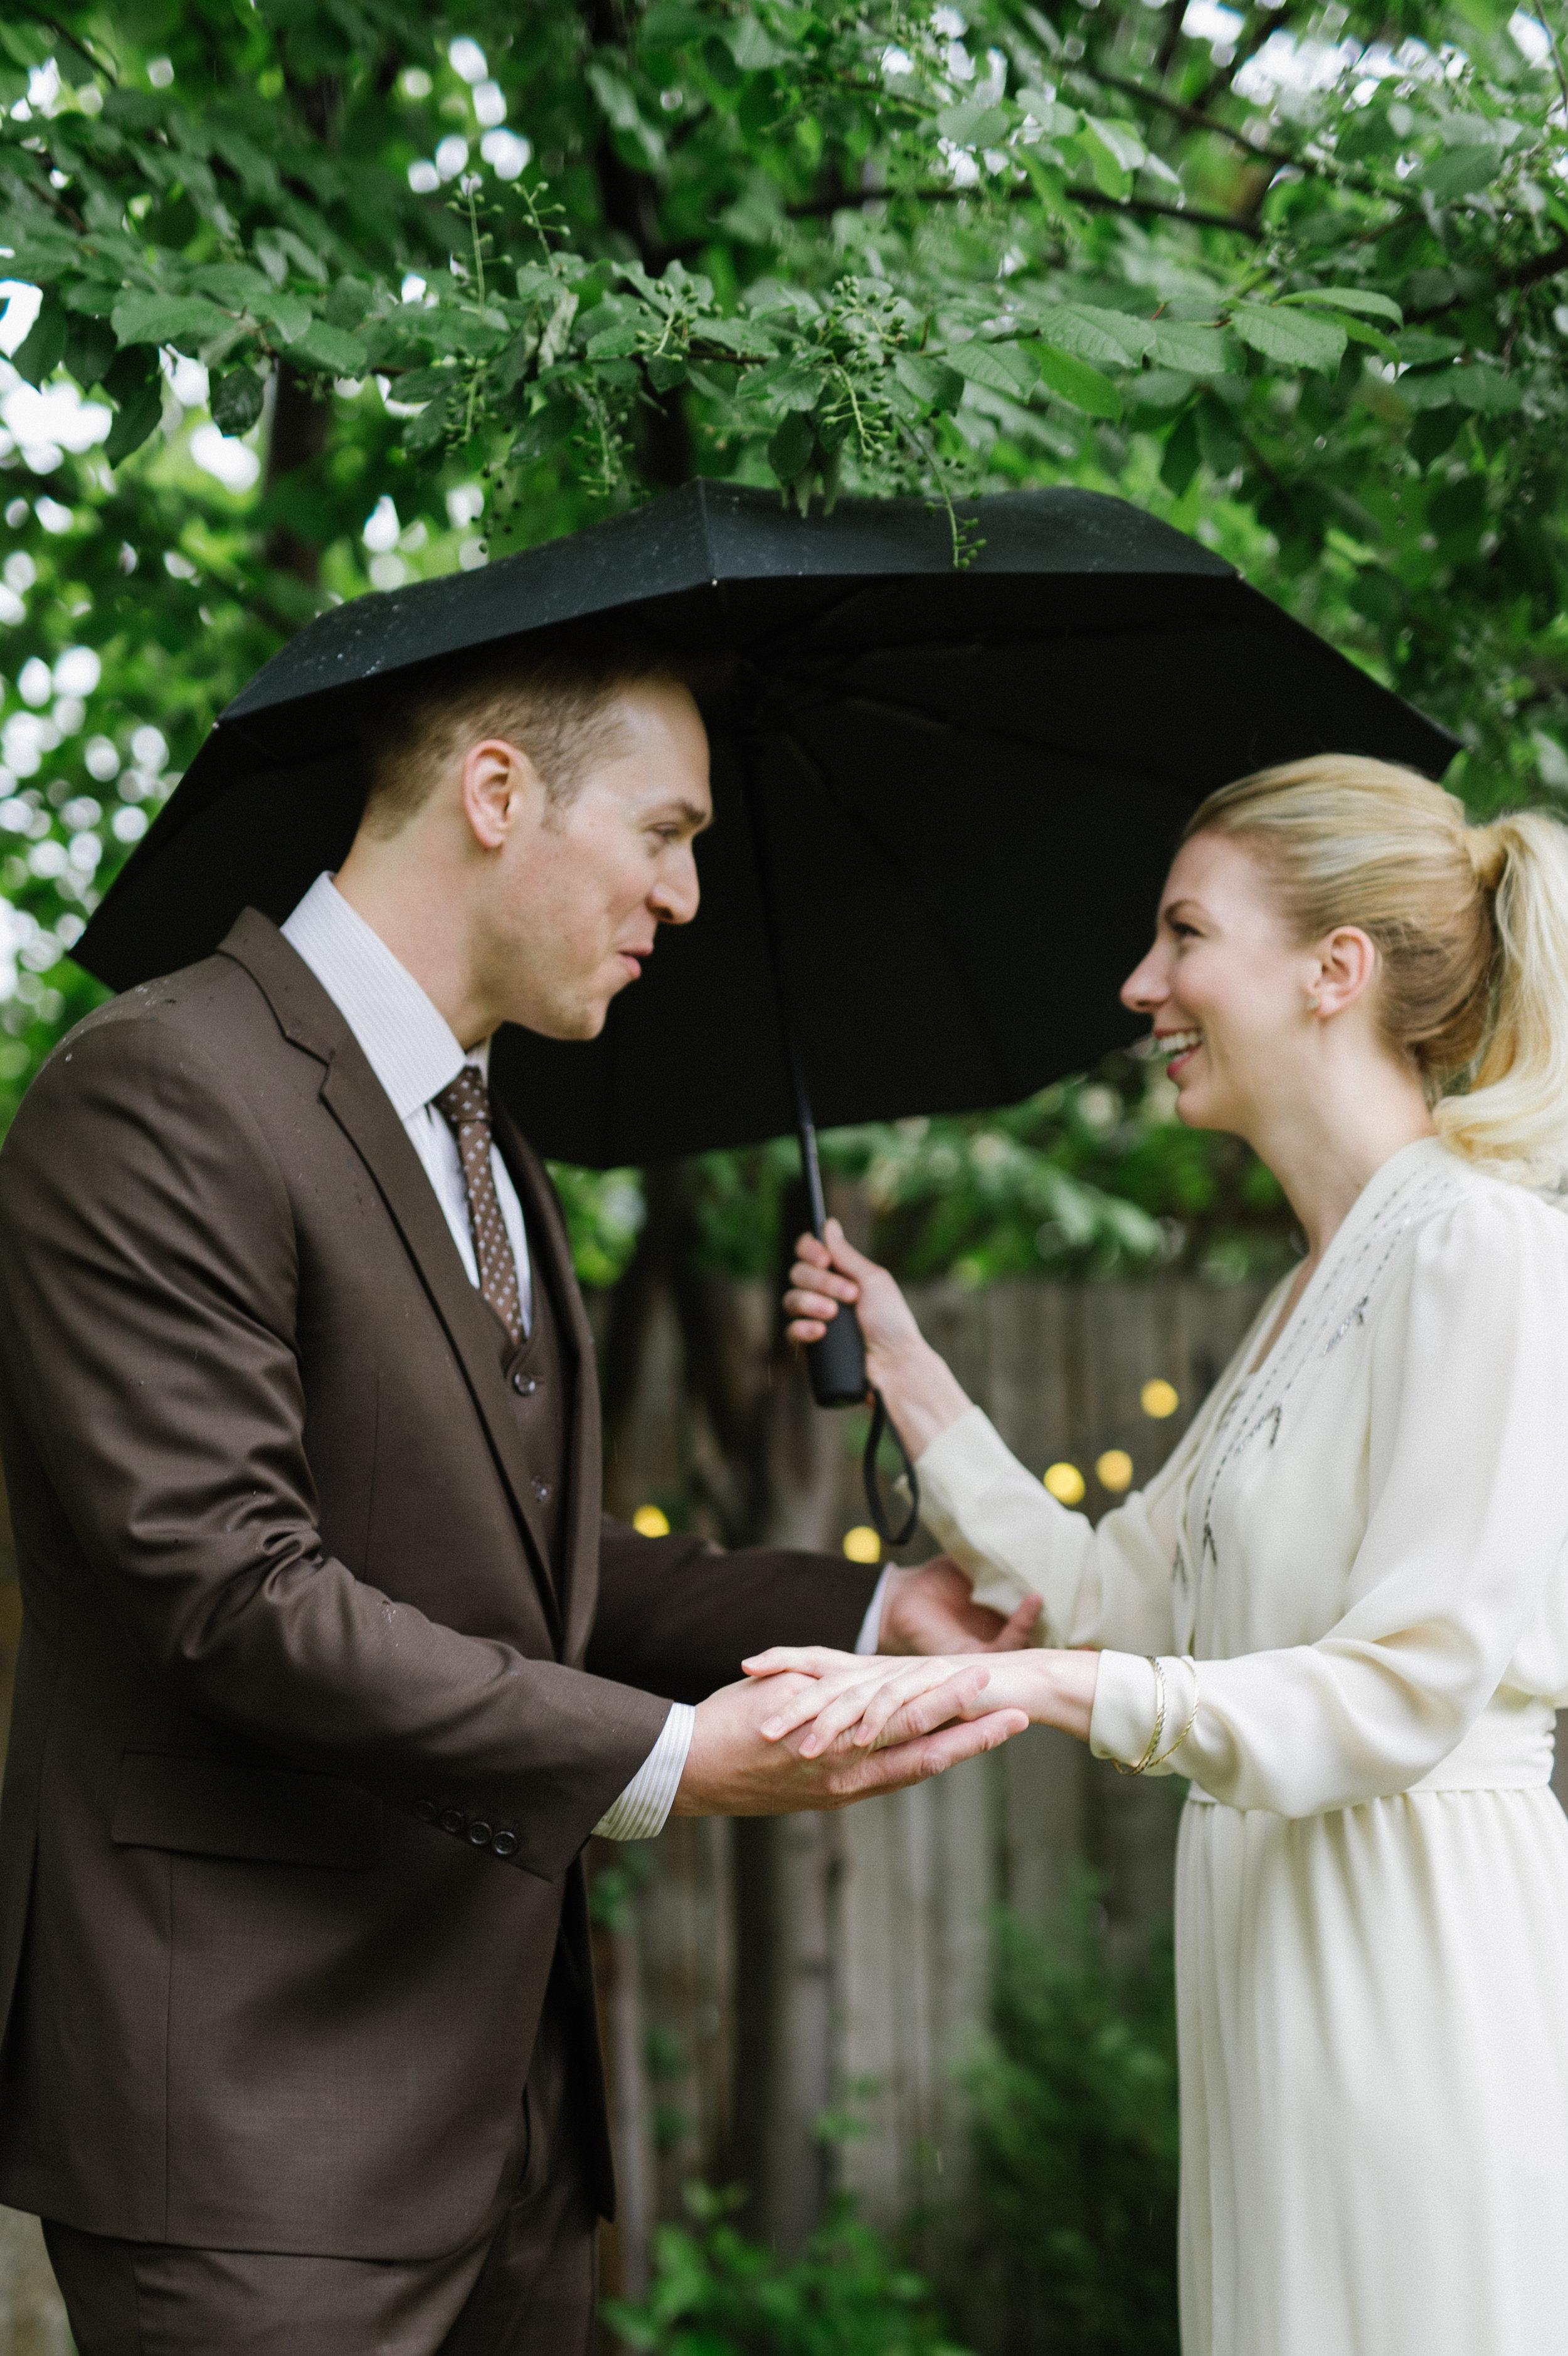 Teatro_Wedding_Calgary_Wedding_Photography_Vanessa_Tom_Married_2018_HR005.jpg